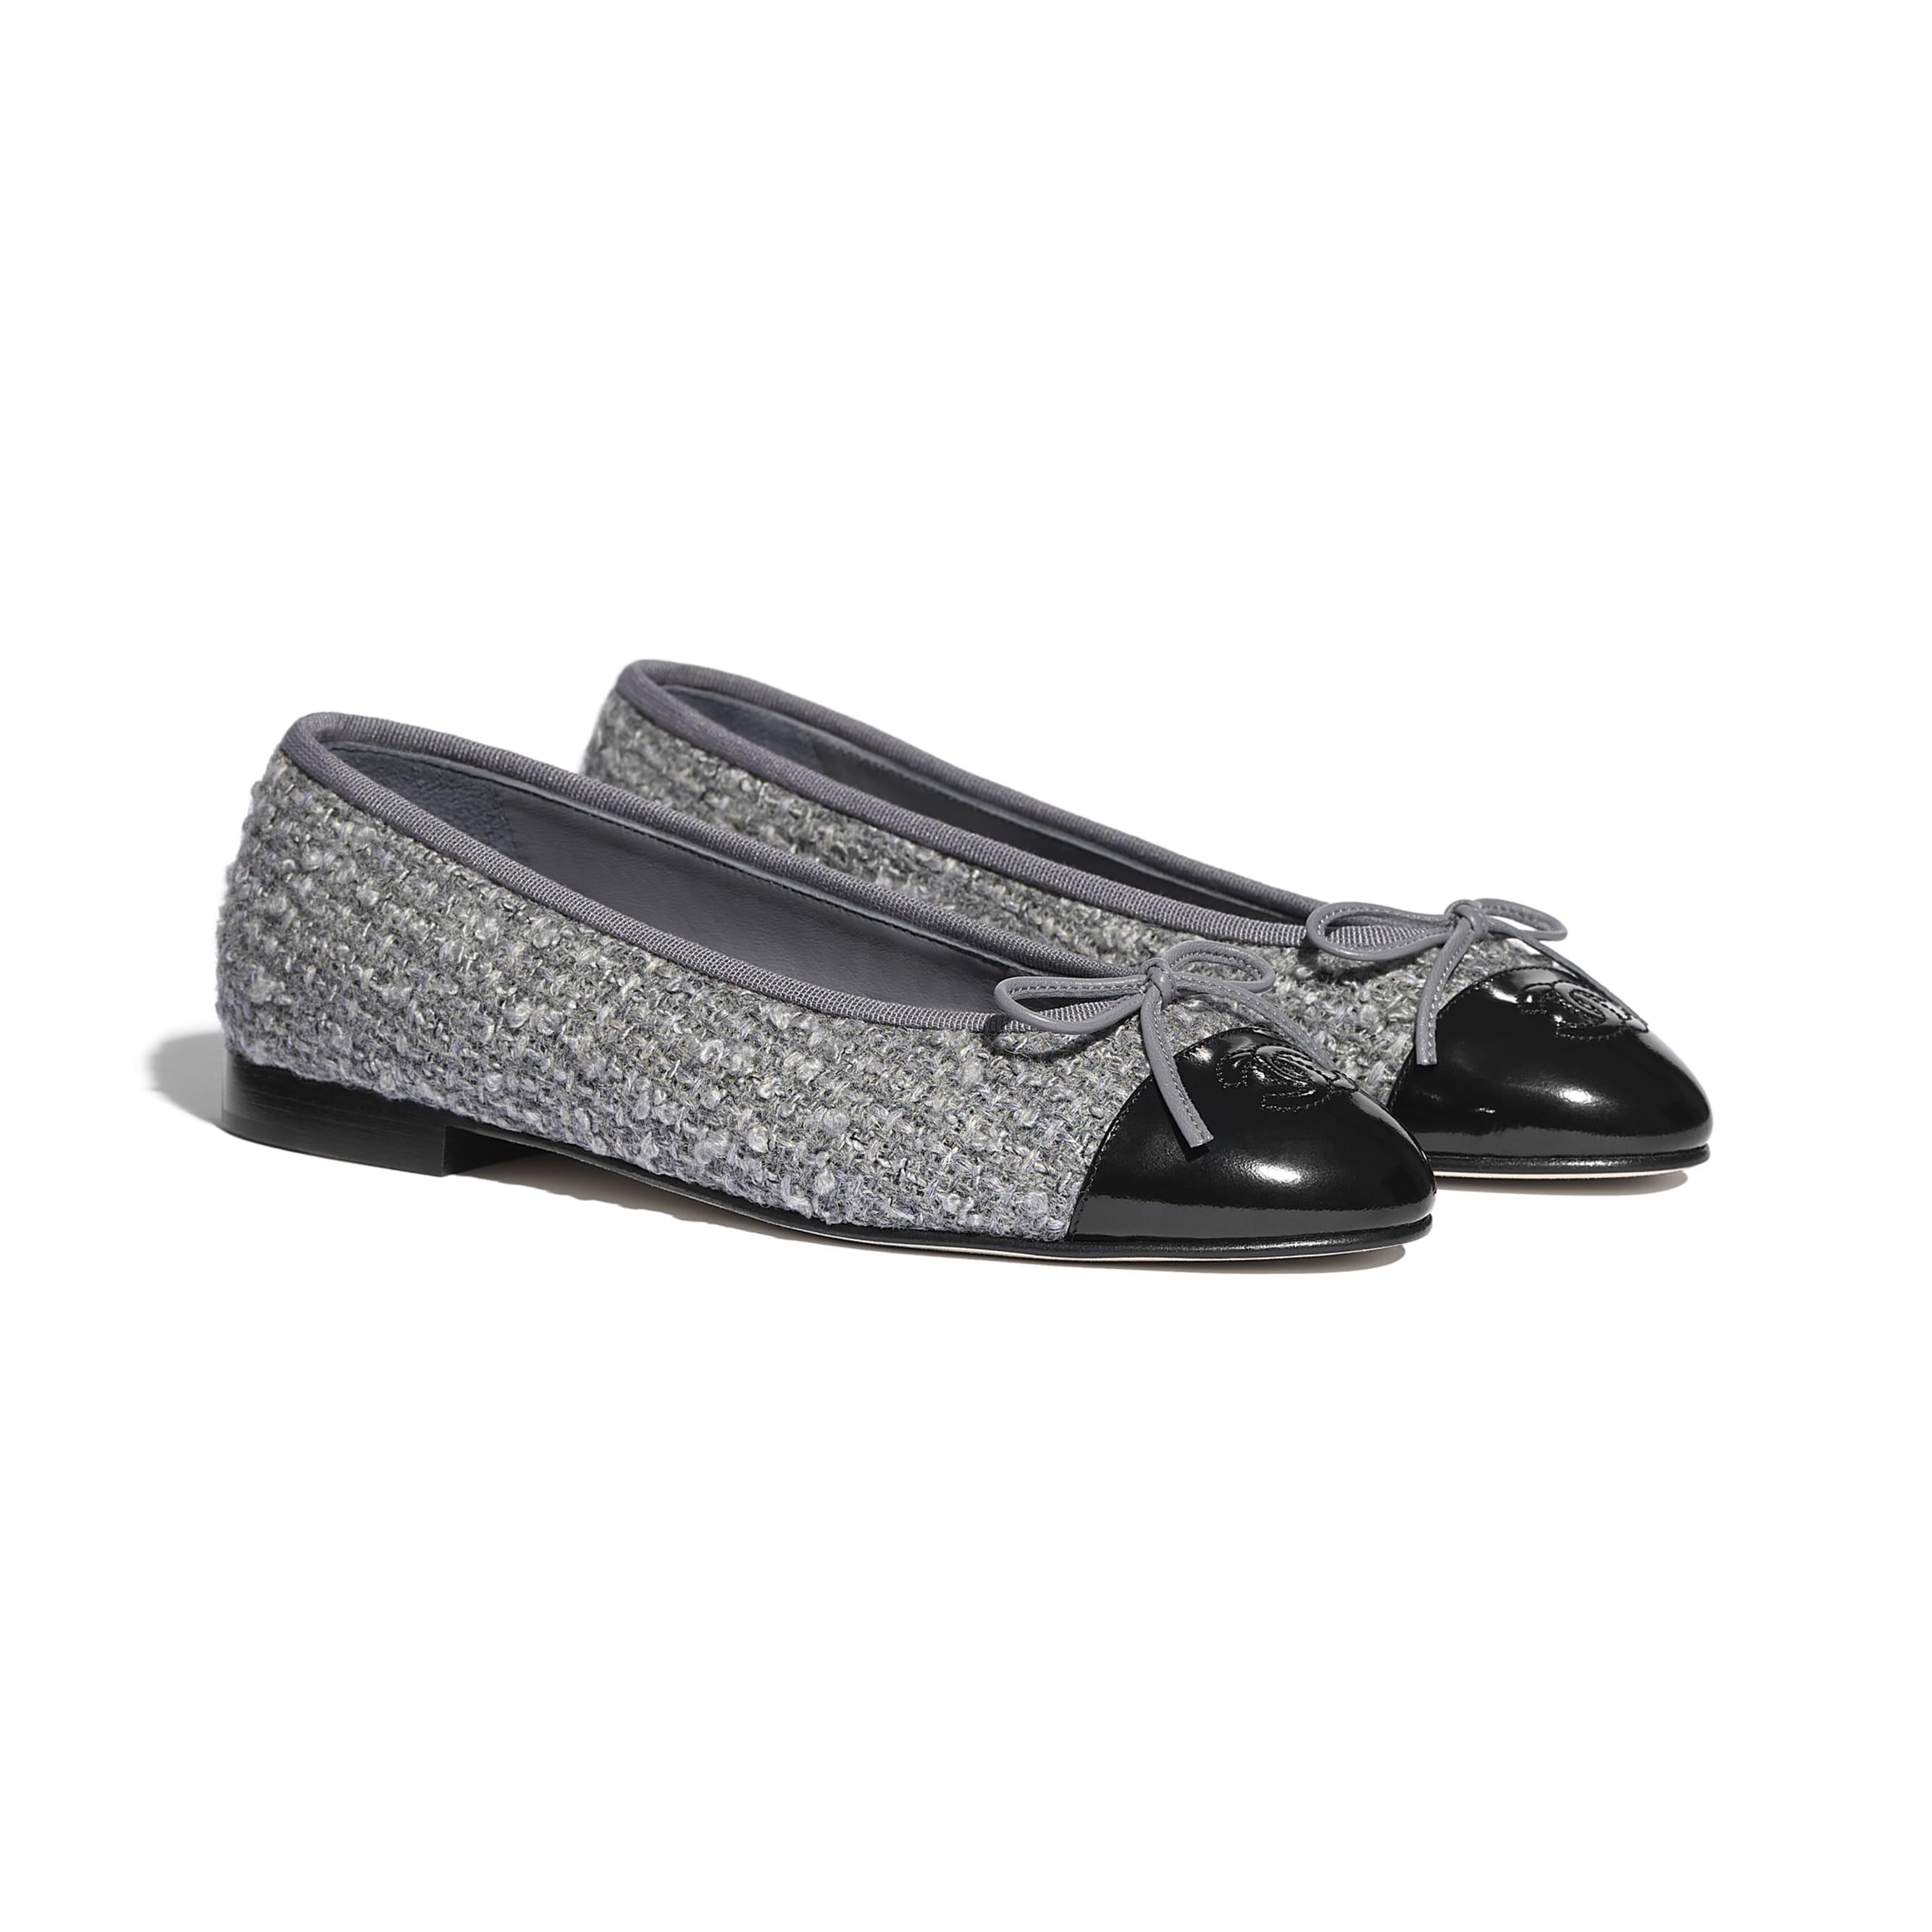 Ballerinas - Gray & Black - Tweed & Calfskin - CHANEL - Alternative view - see standard sized version